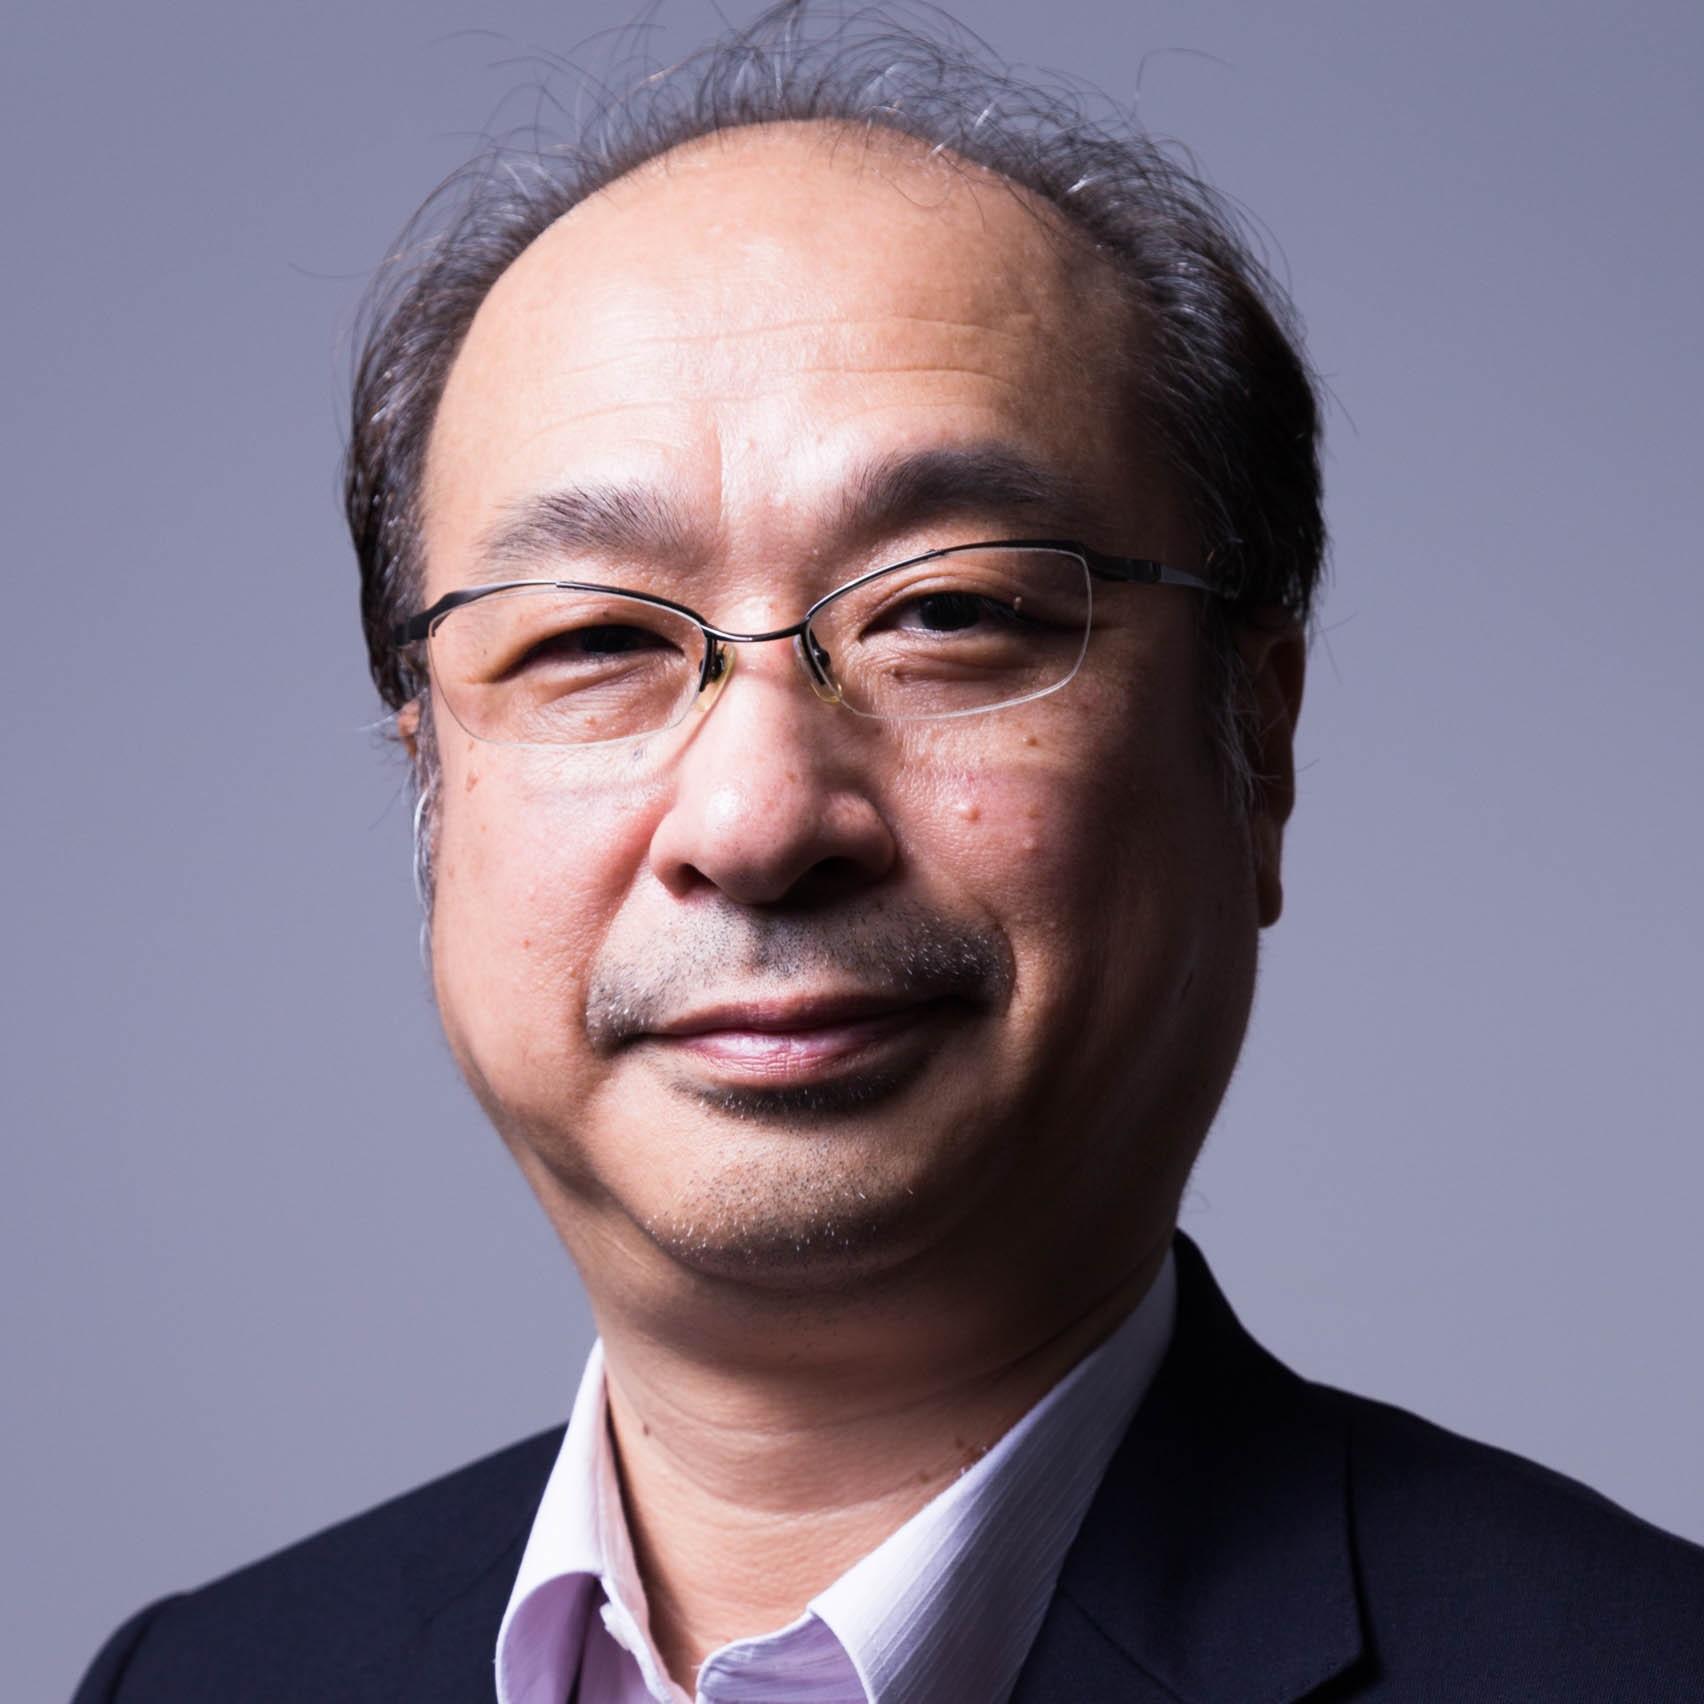 小林 賢一郎 - Kenichiro Kobayashi